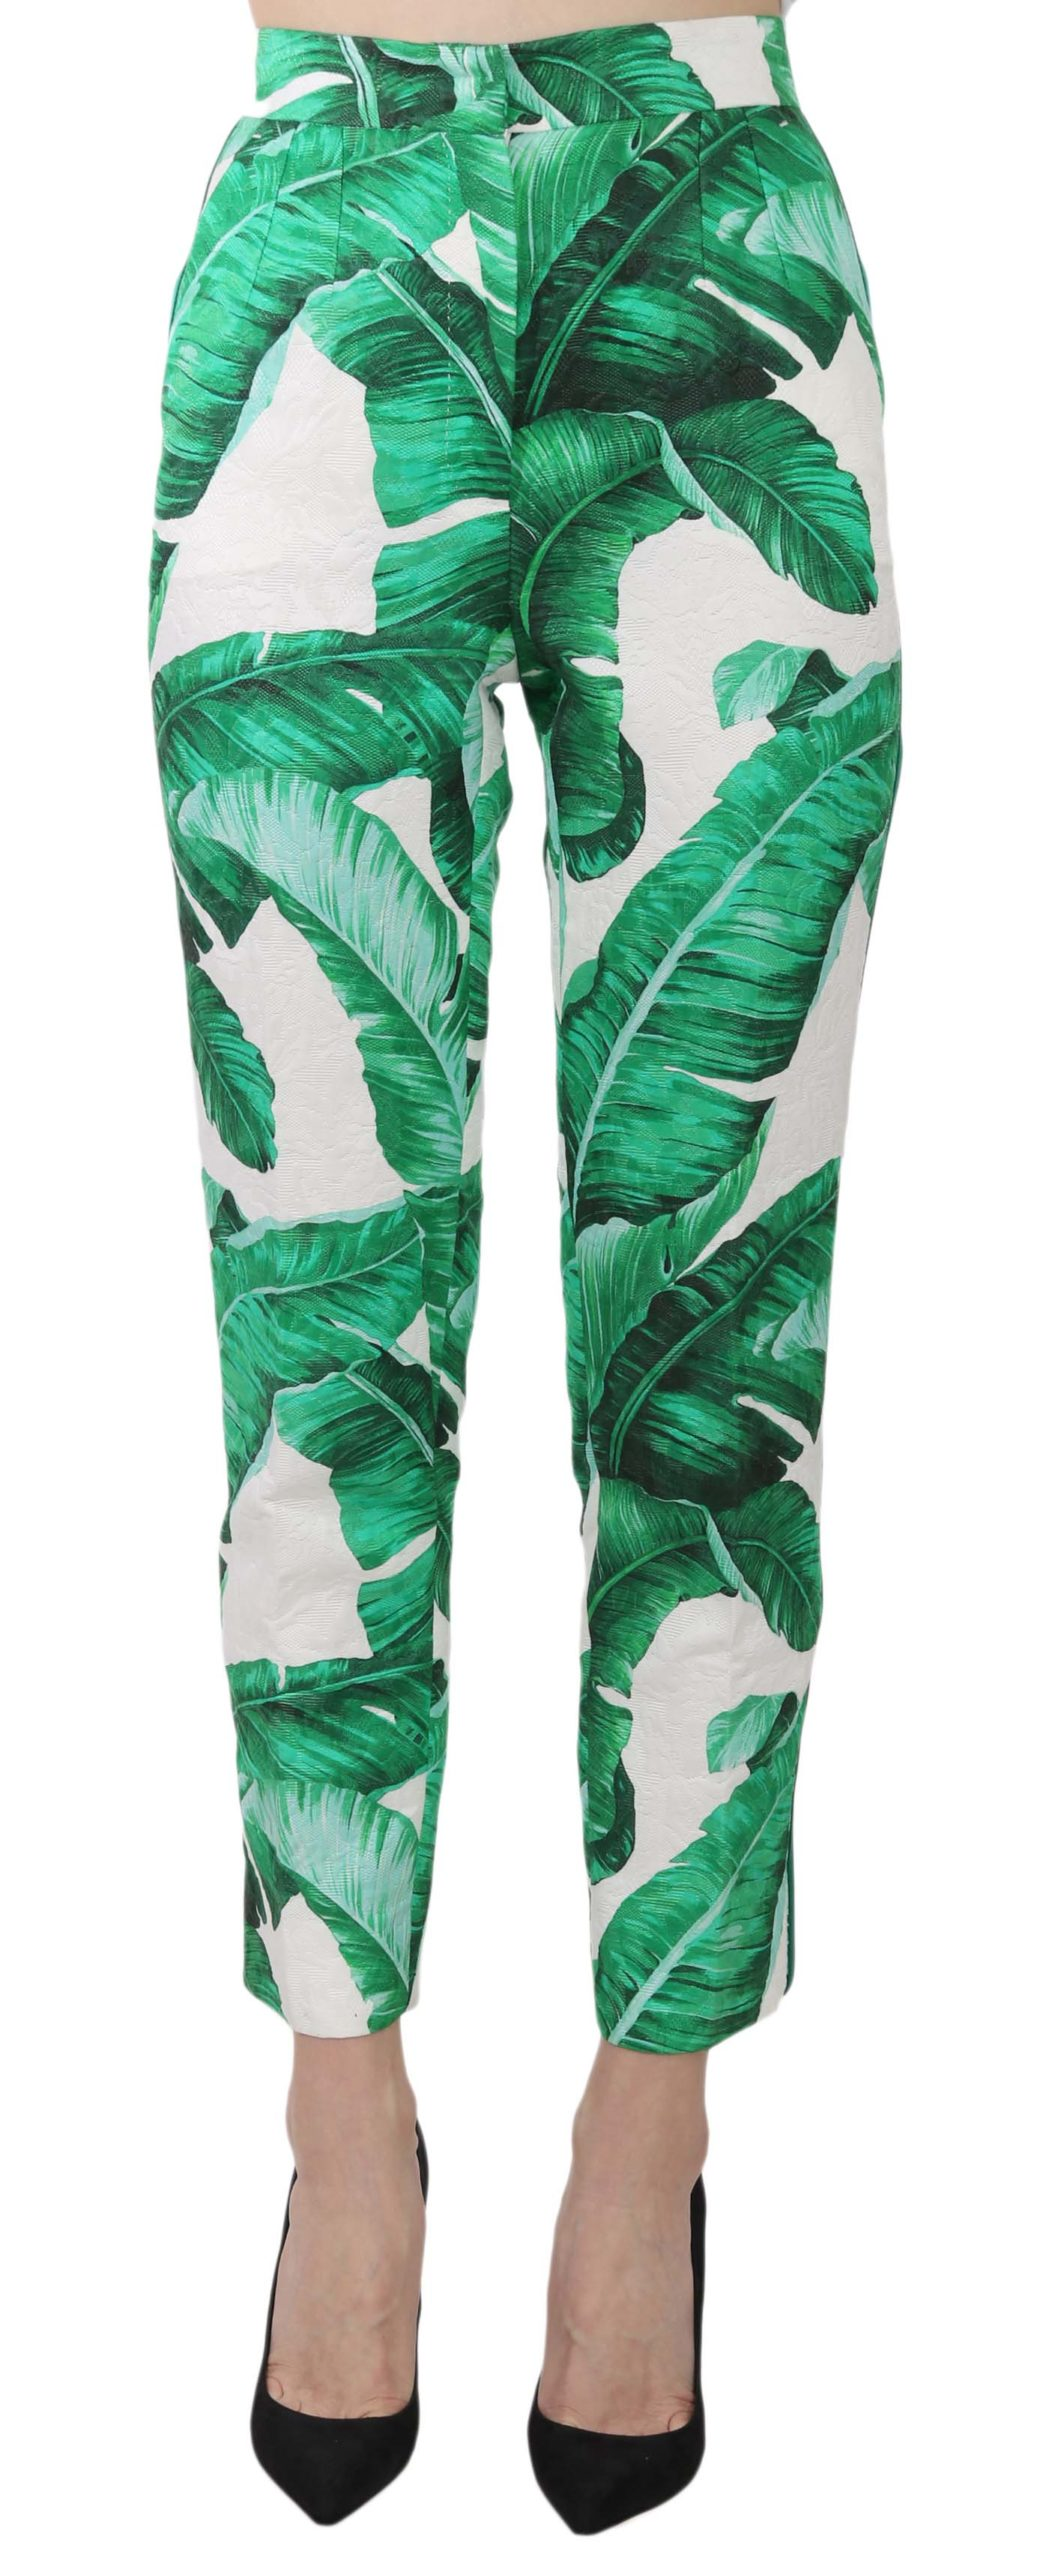 Dolce & Gabbana Women Banana Leaf Print Jaquard Trouser Slim Pants Green PAN61207 - IT38 XS